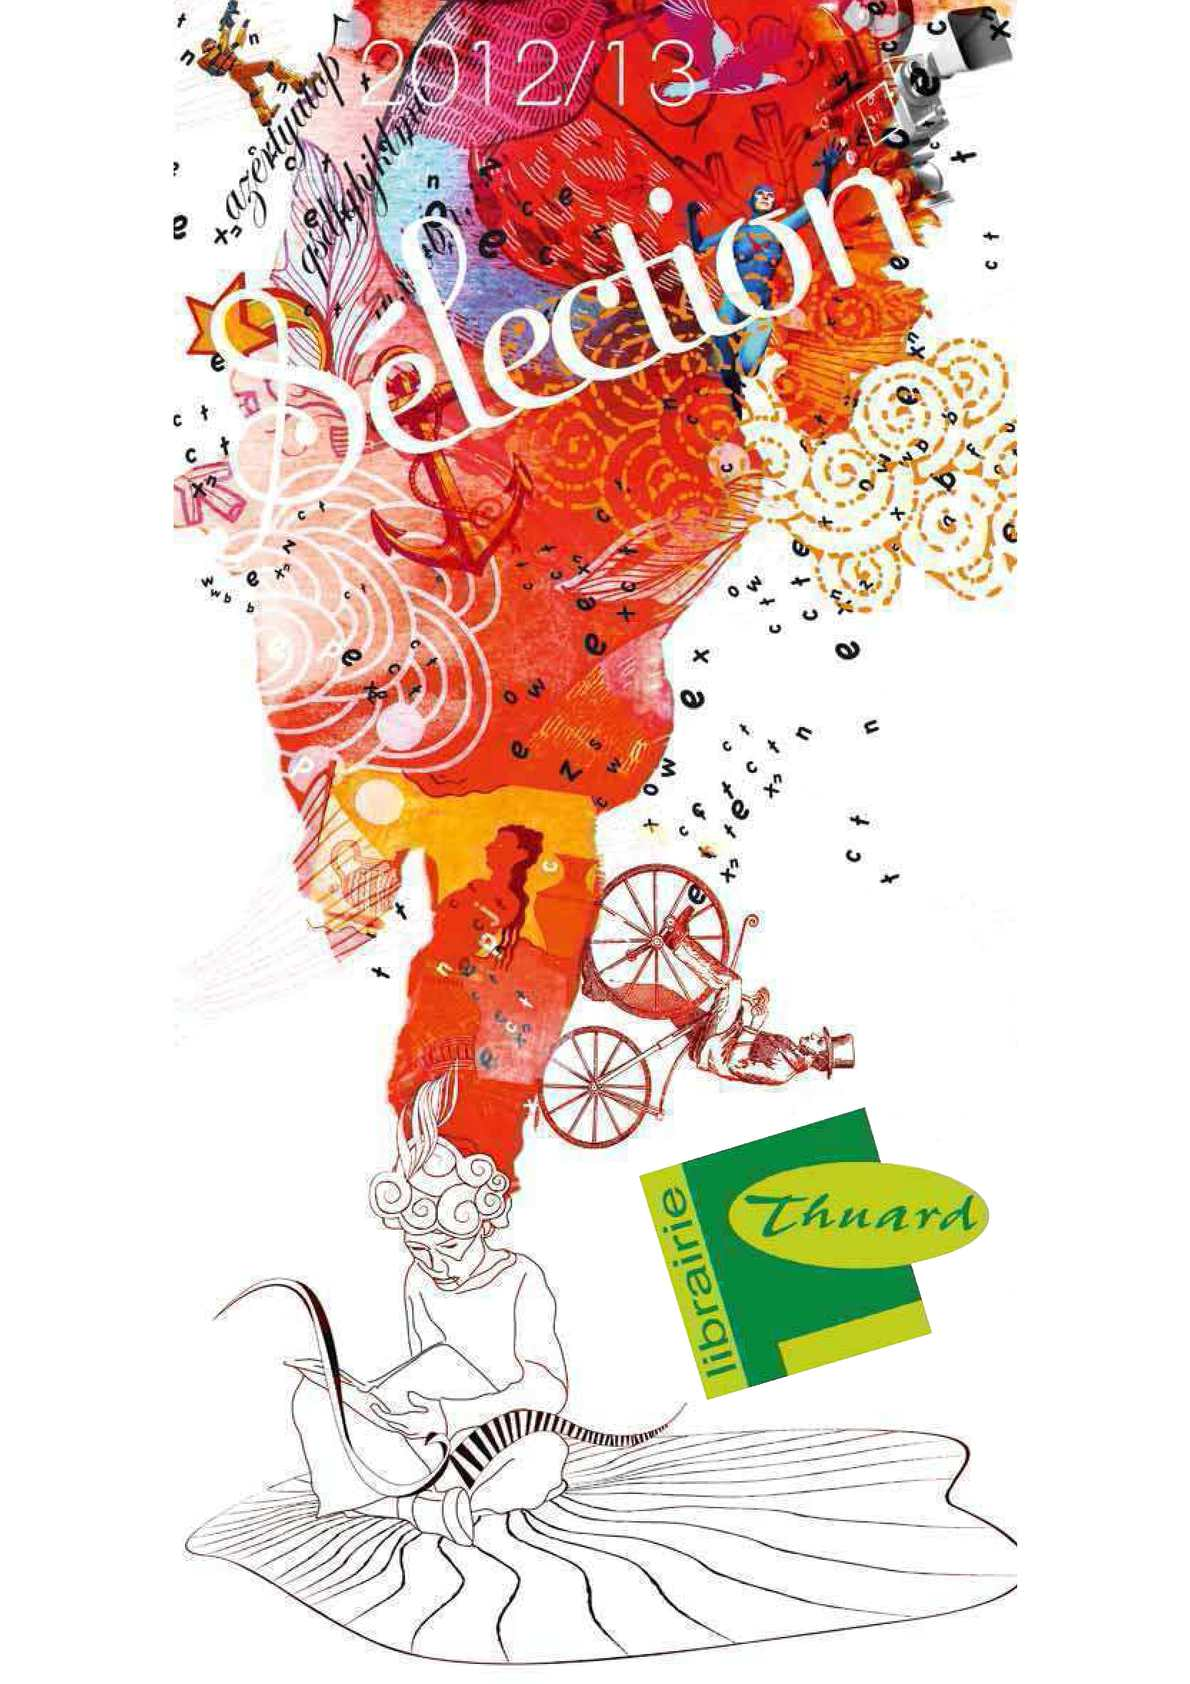 7d9efdd0abbf Calaméo - Catalogue de la librairie Thuard - Noël 2012